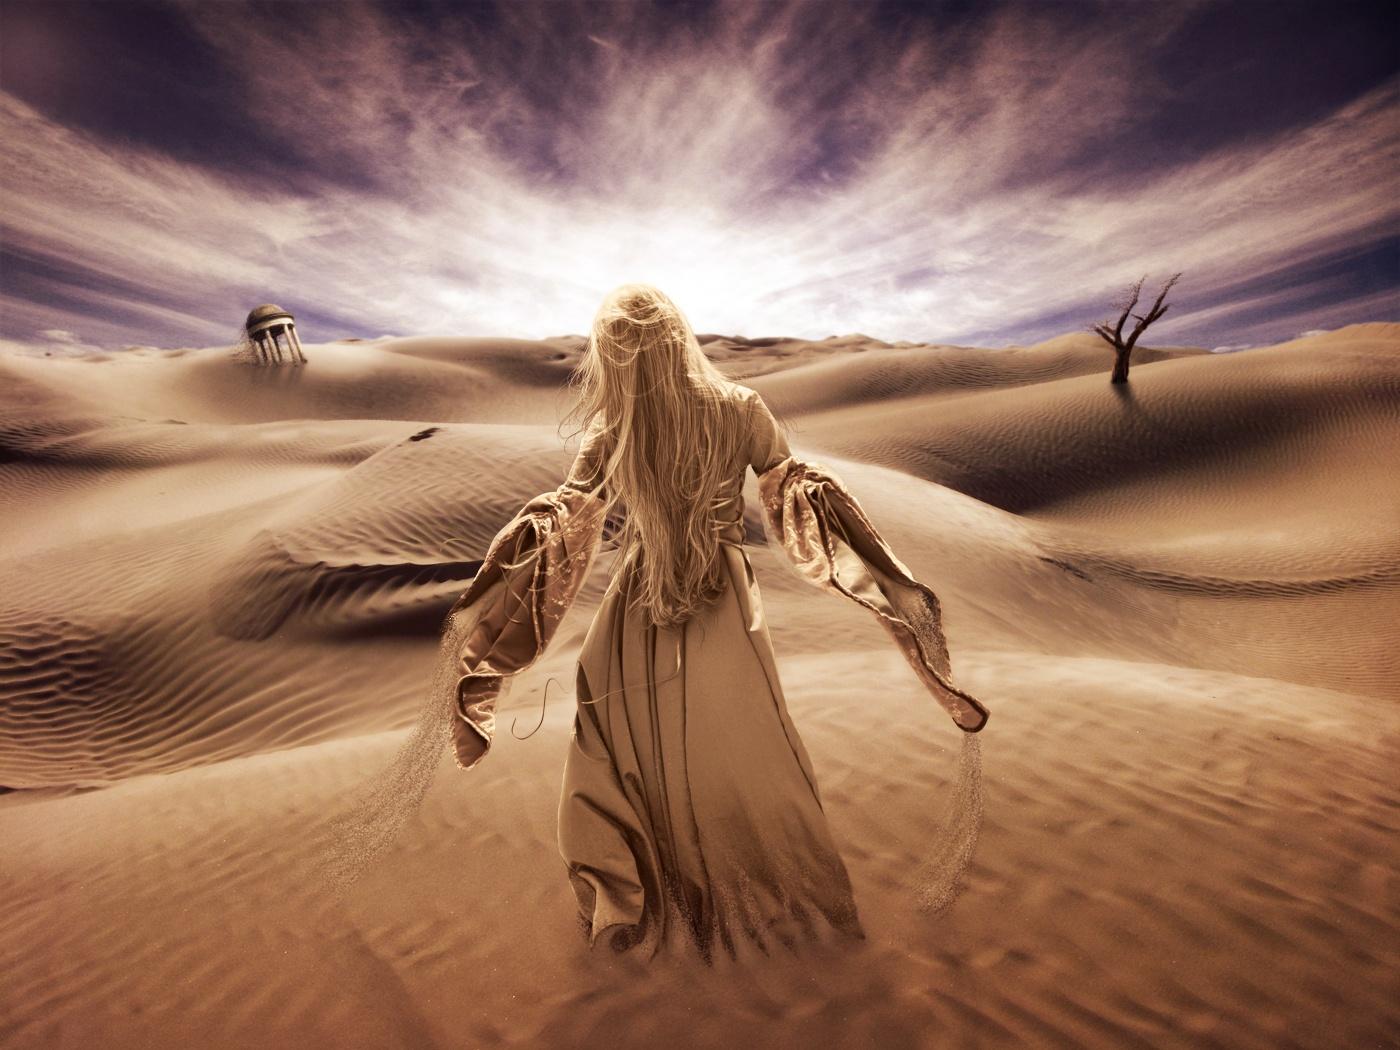 Create a Surreal Desert Scene in Photoshop